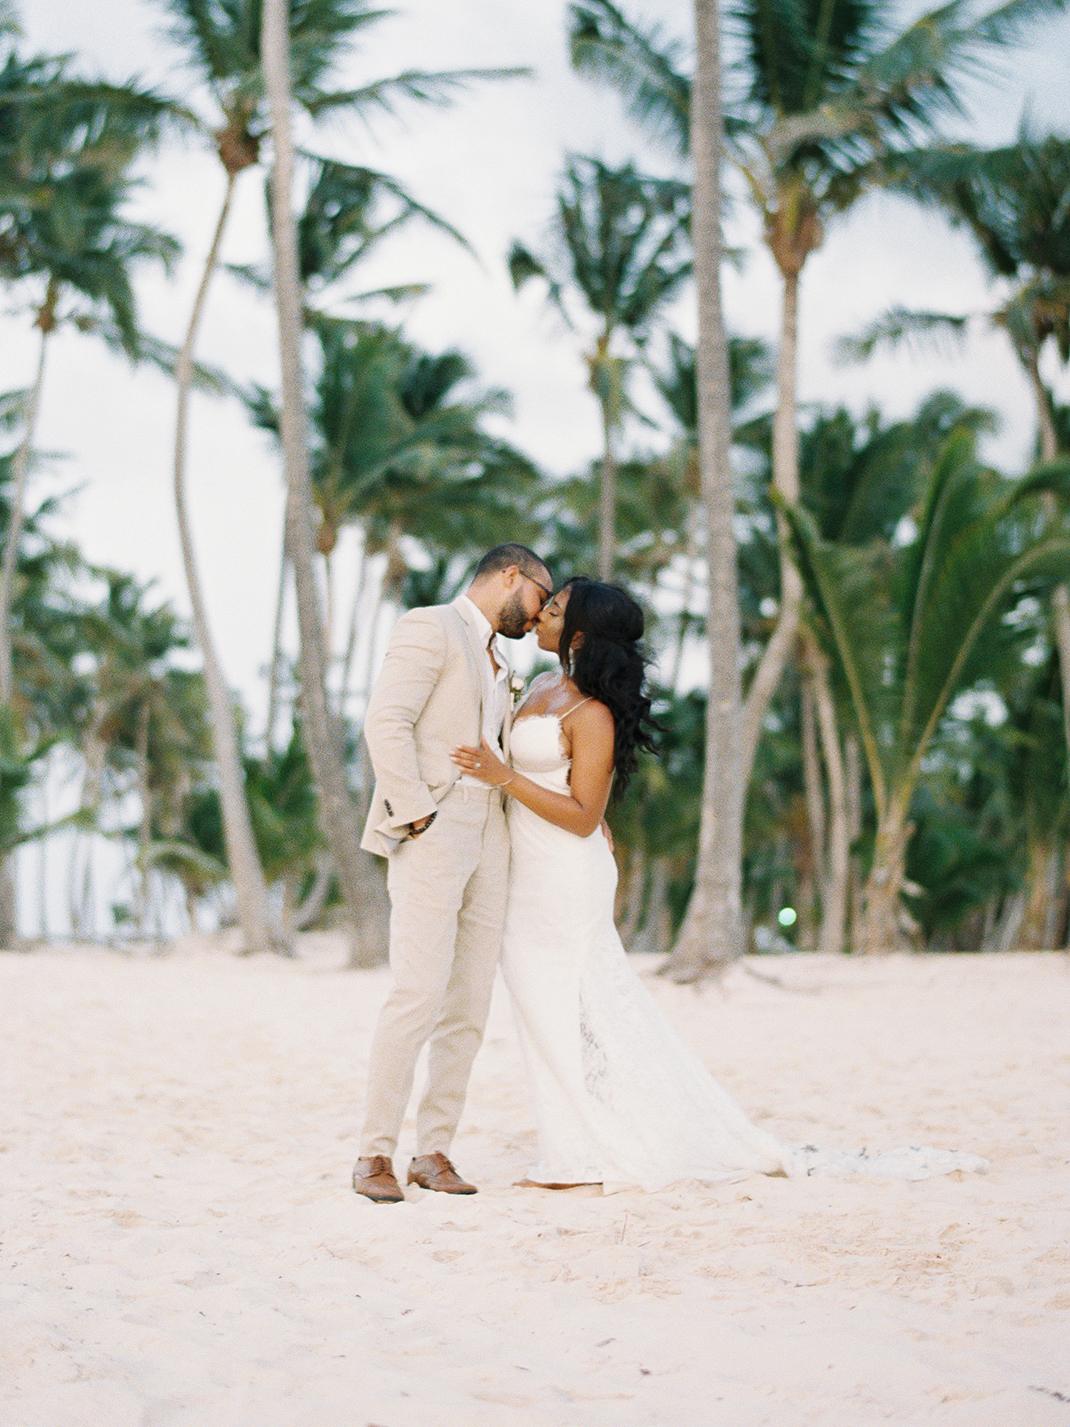 Asia Pimentel - Destination Wedding Photographer-67.jpg